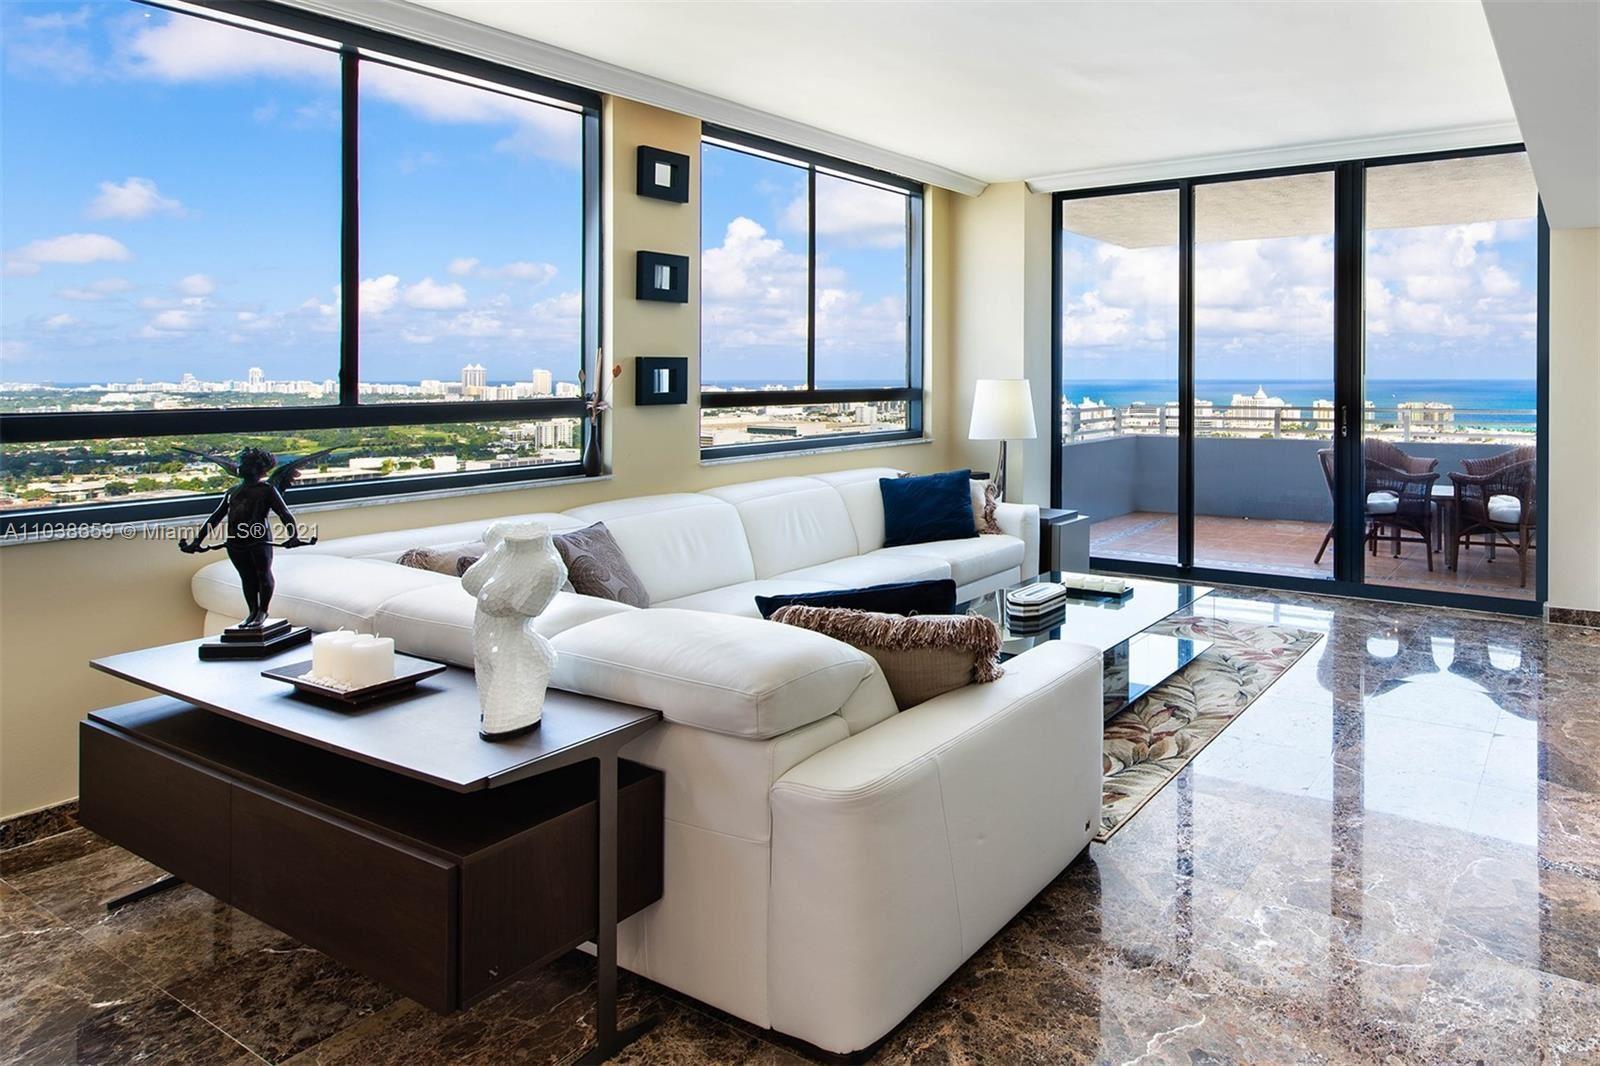 1330 West Ave #3605, Miami Beach, FL 33139 - #: A11038659